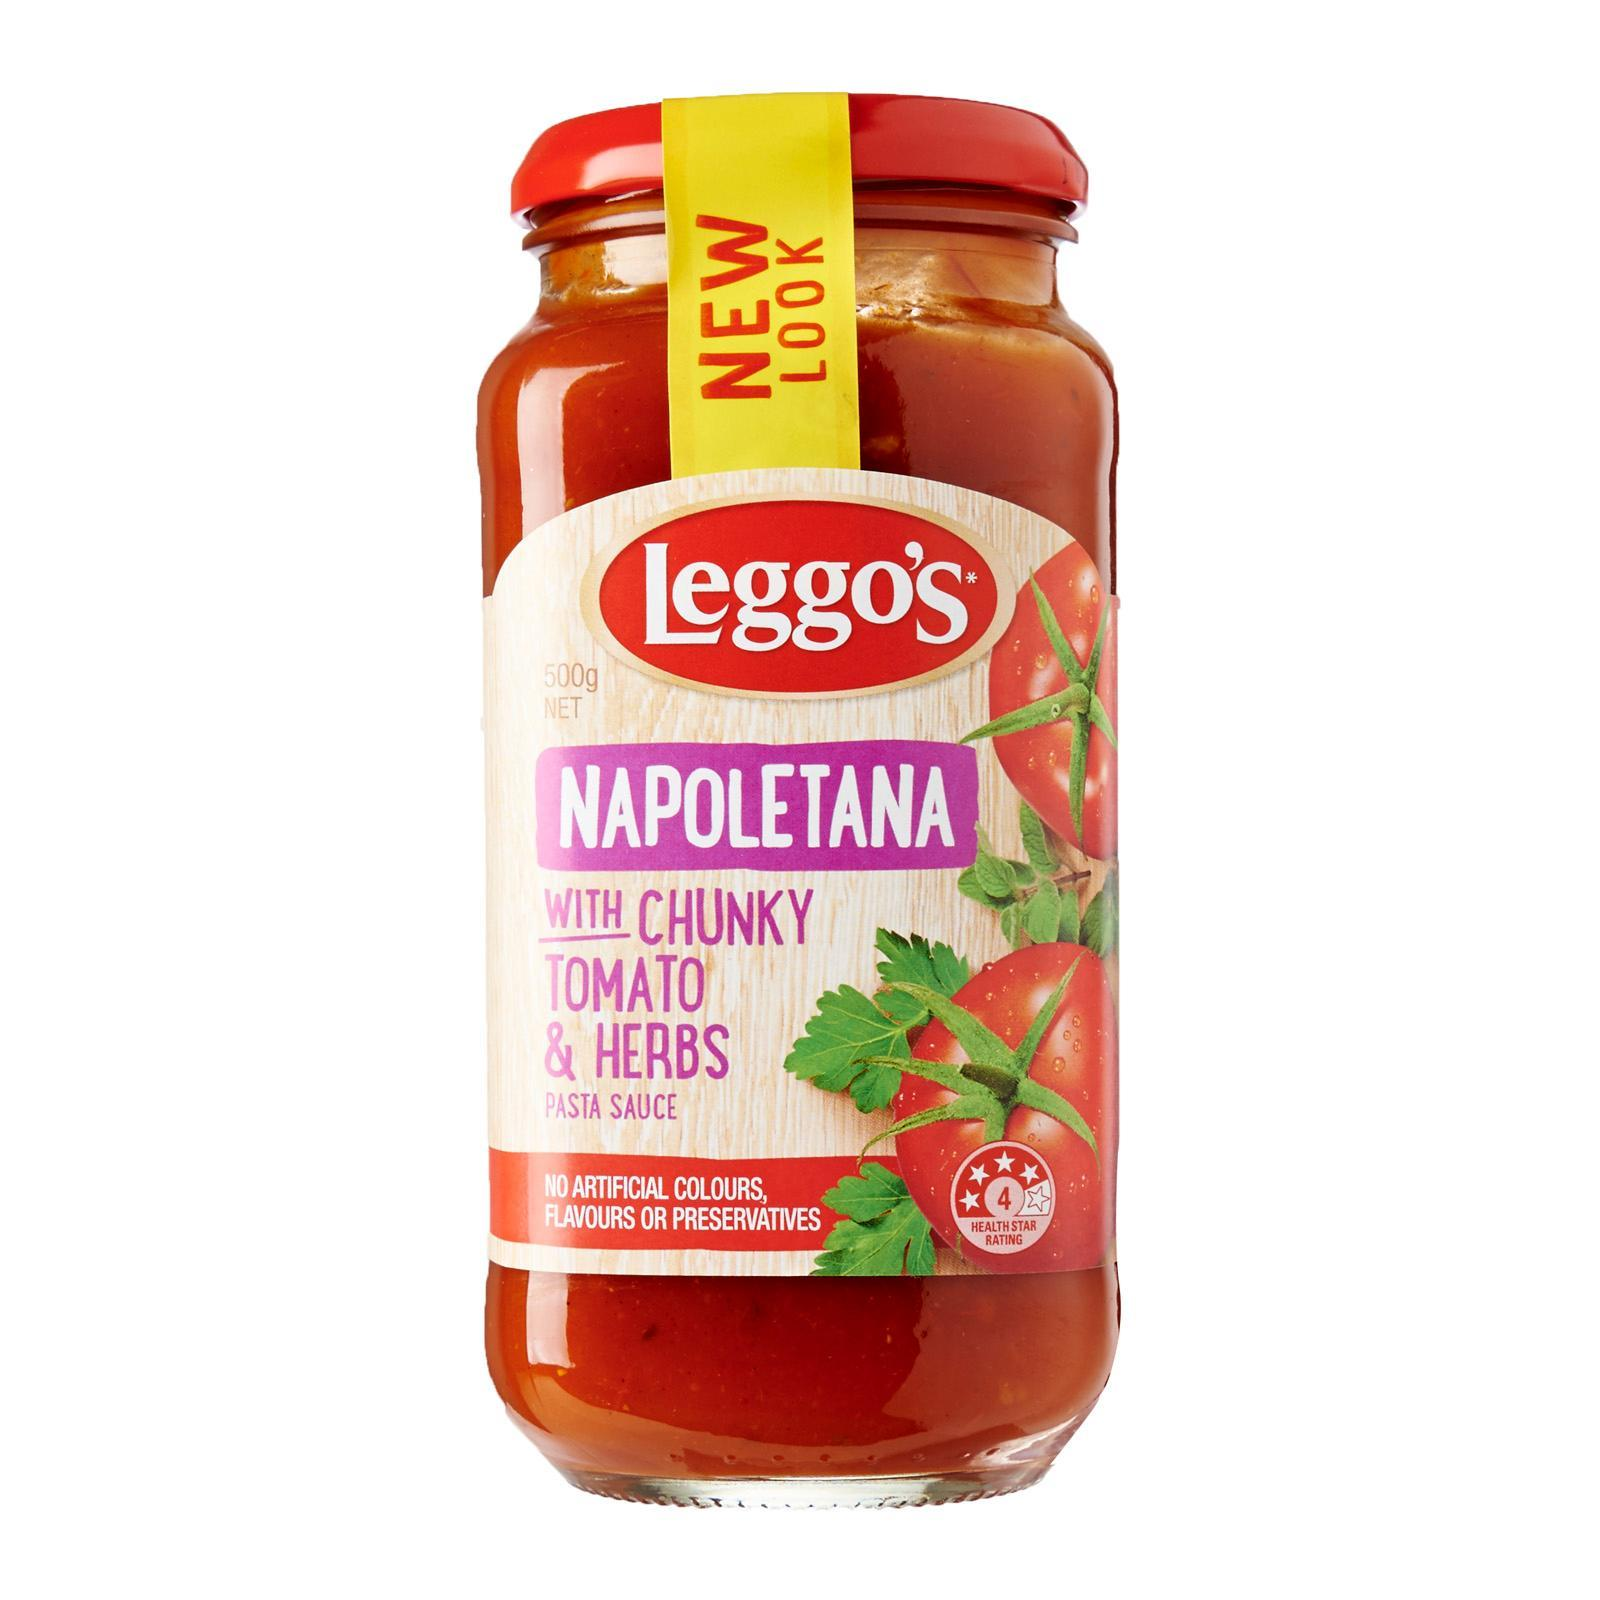 Leggo's Napoletana Pasta Sauce